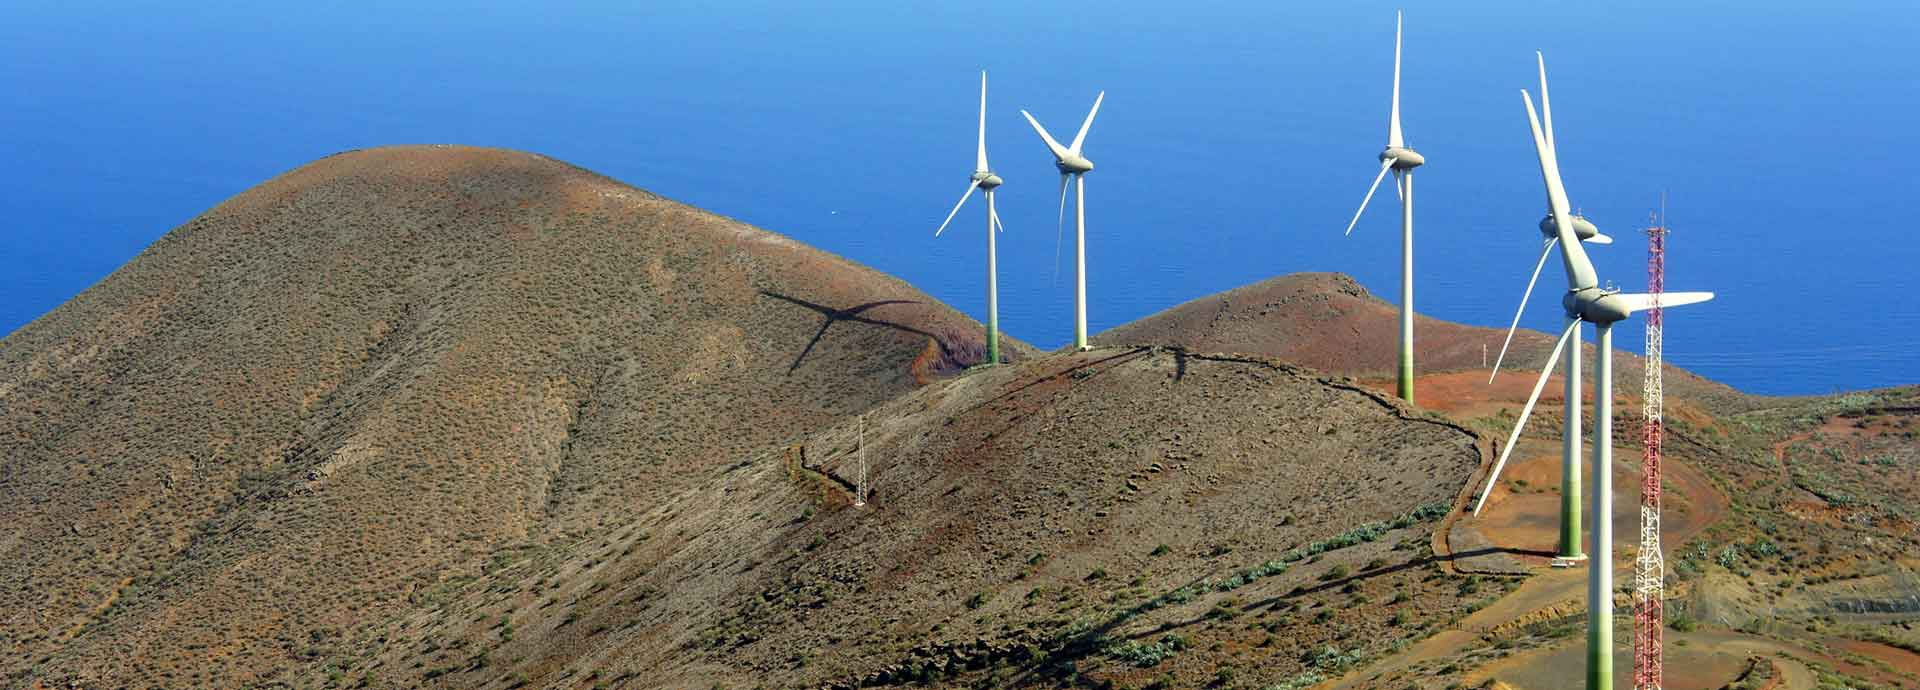 Green Innovation Islands adopting renewables